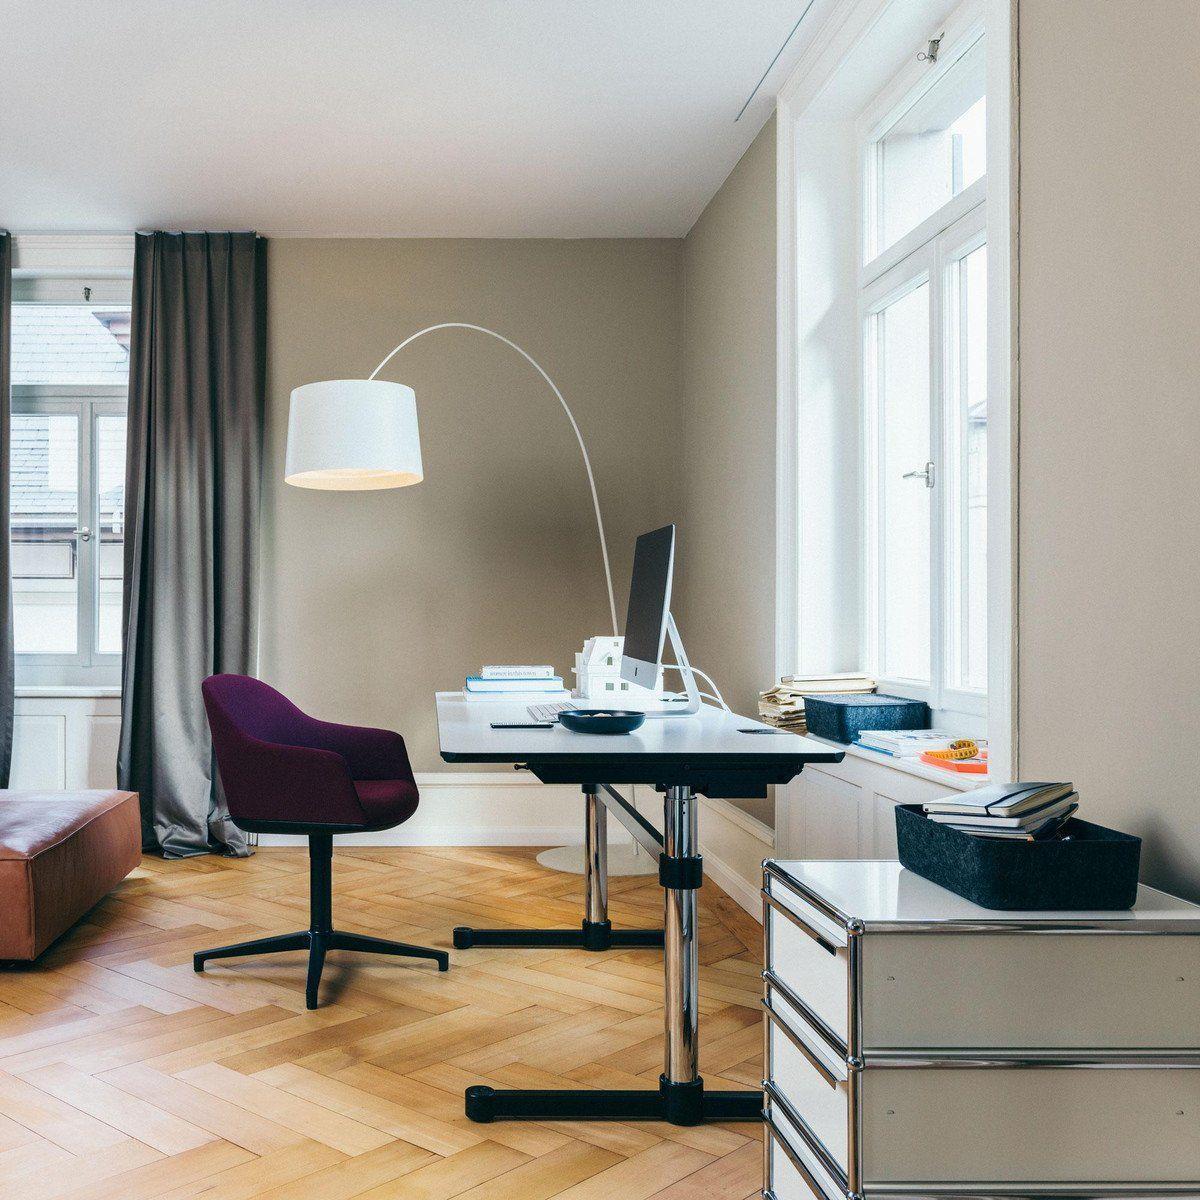 usm kitos m plus schreibtisch usm haller. Black Bedroom Furniture Sets. Home Design Ideas